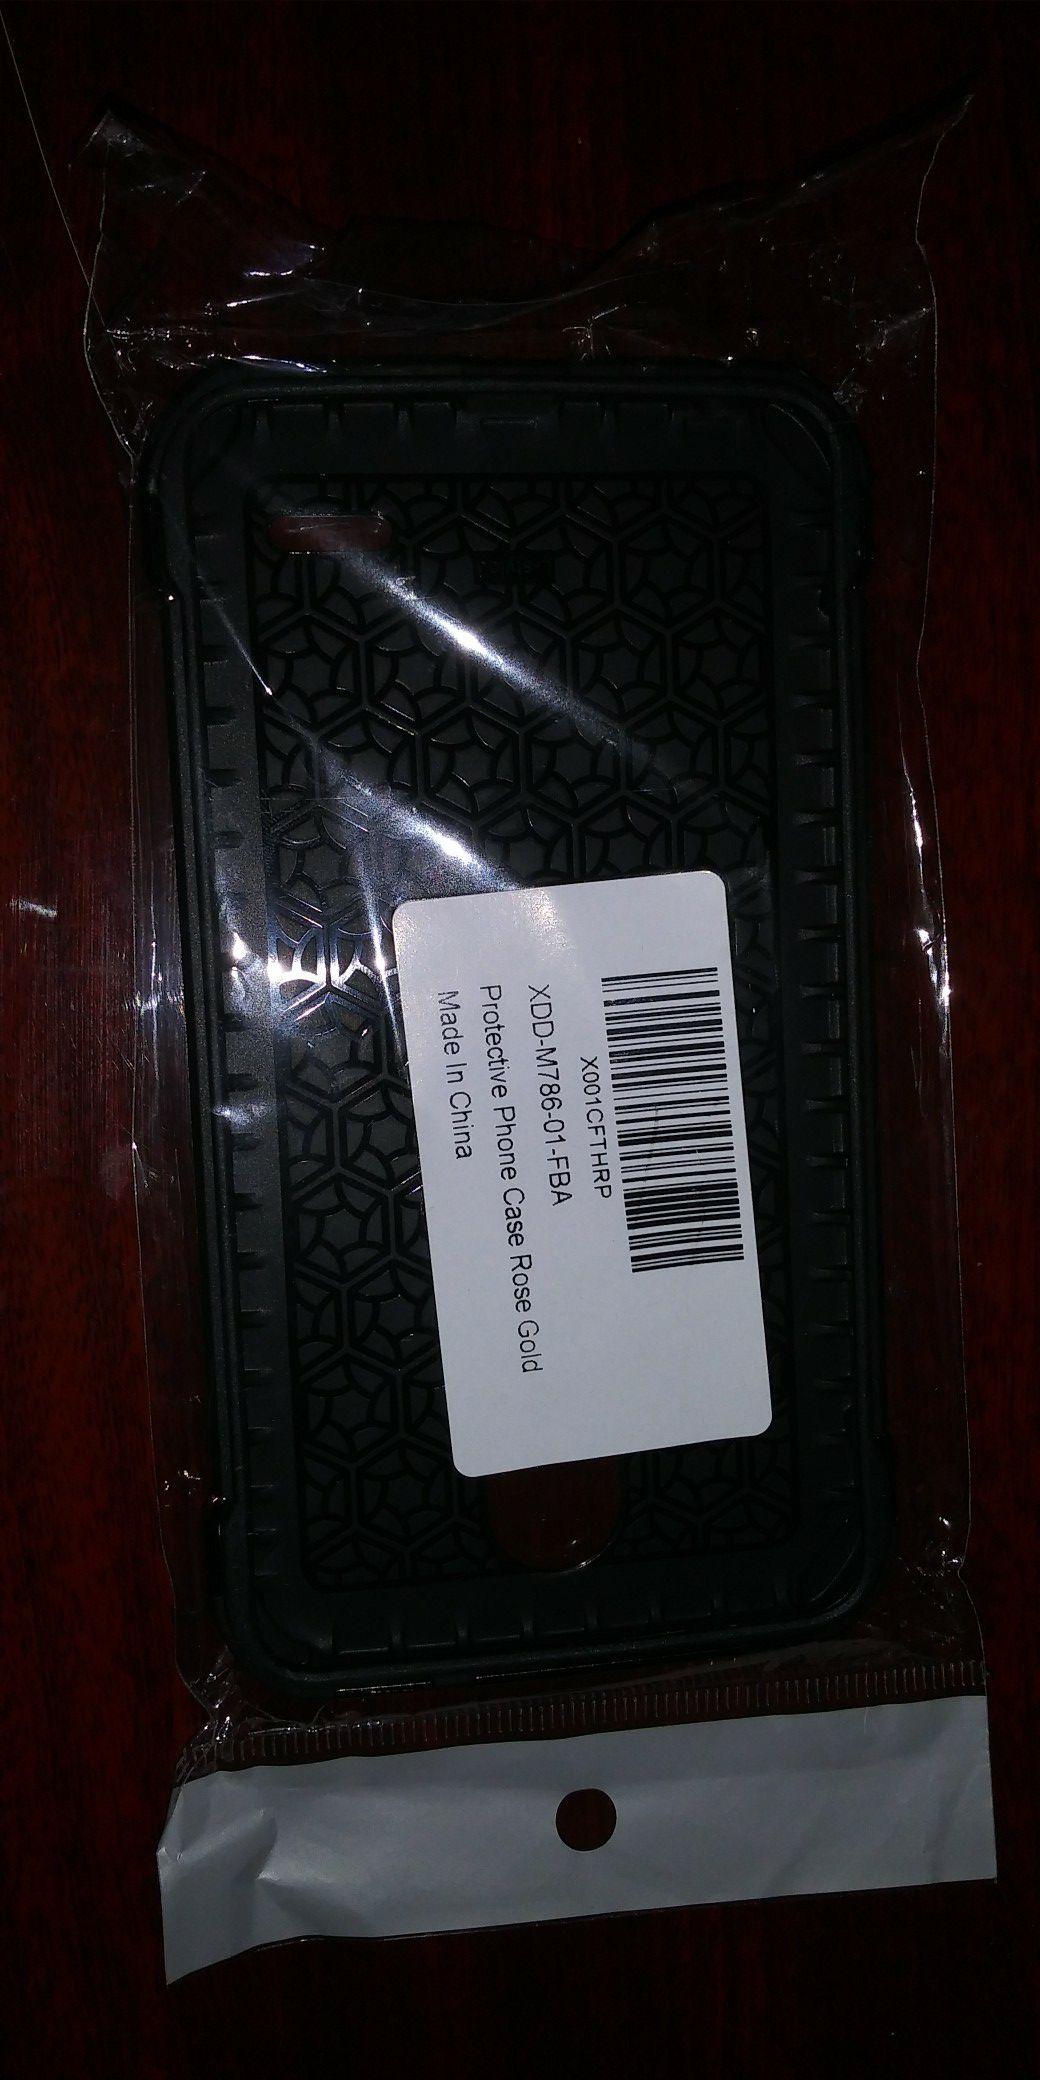 LG Stylo 3 Plus Phone Case